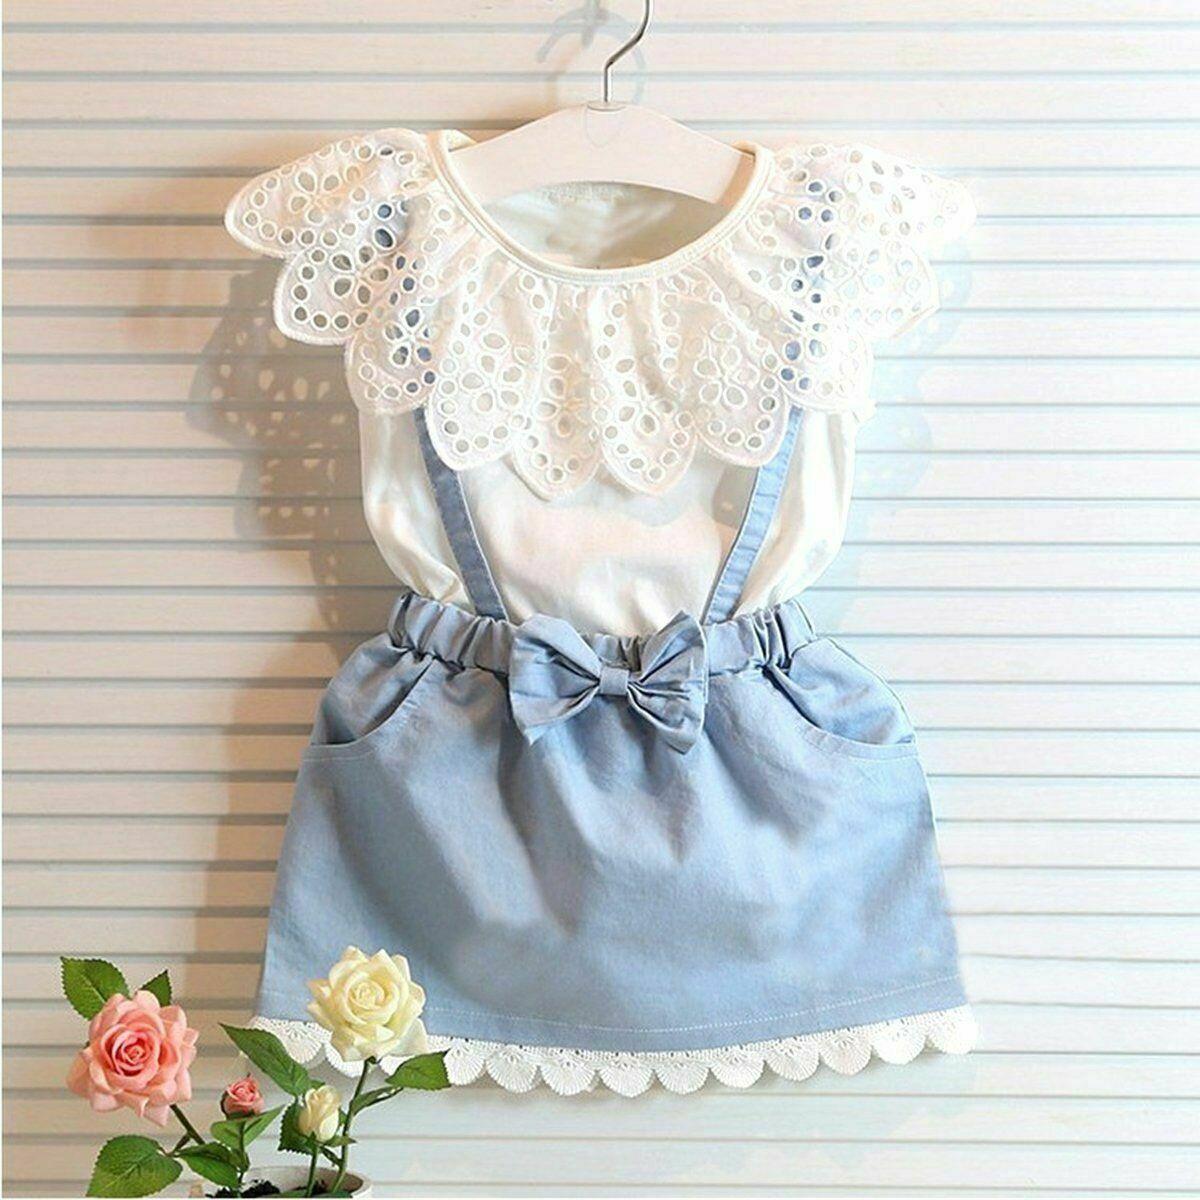 2-7T Toddler Kids Girls Dress Baby Girl Cotton Dress Cute Princess Sleeveless Denim Tulle Bowknot High-quality Dresses